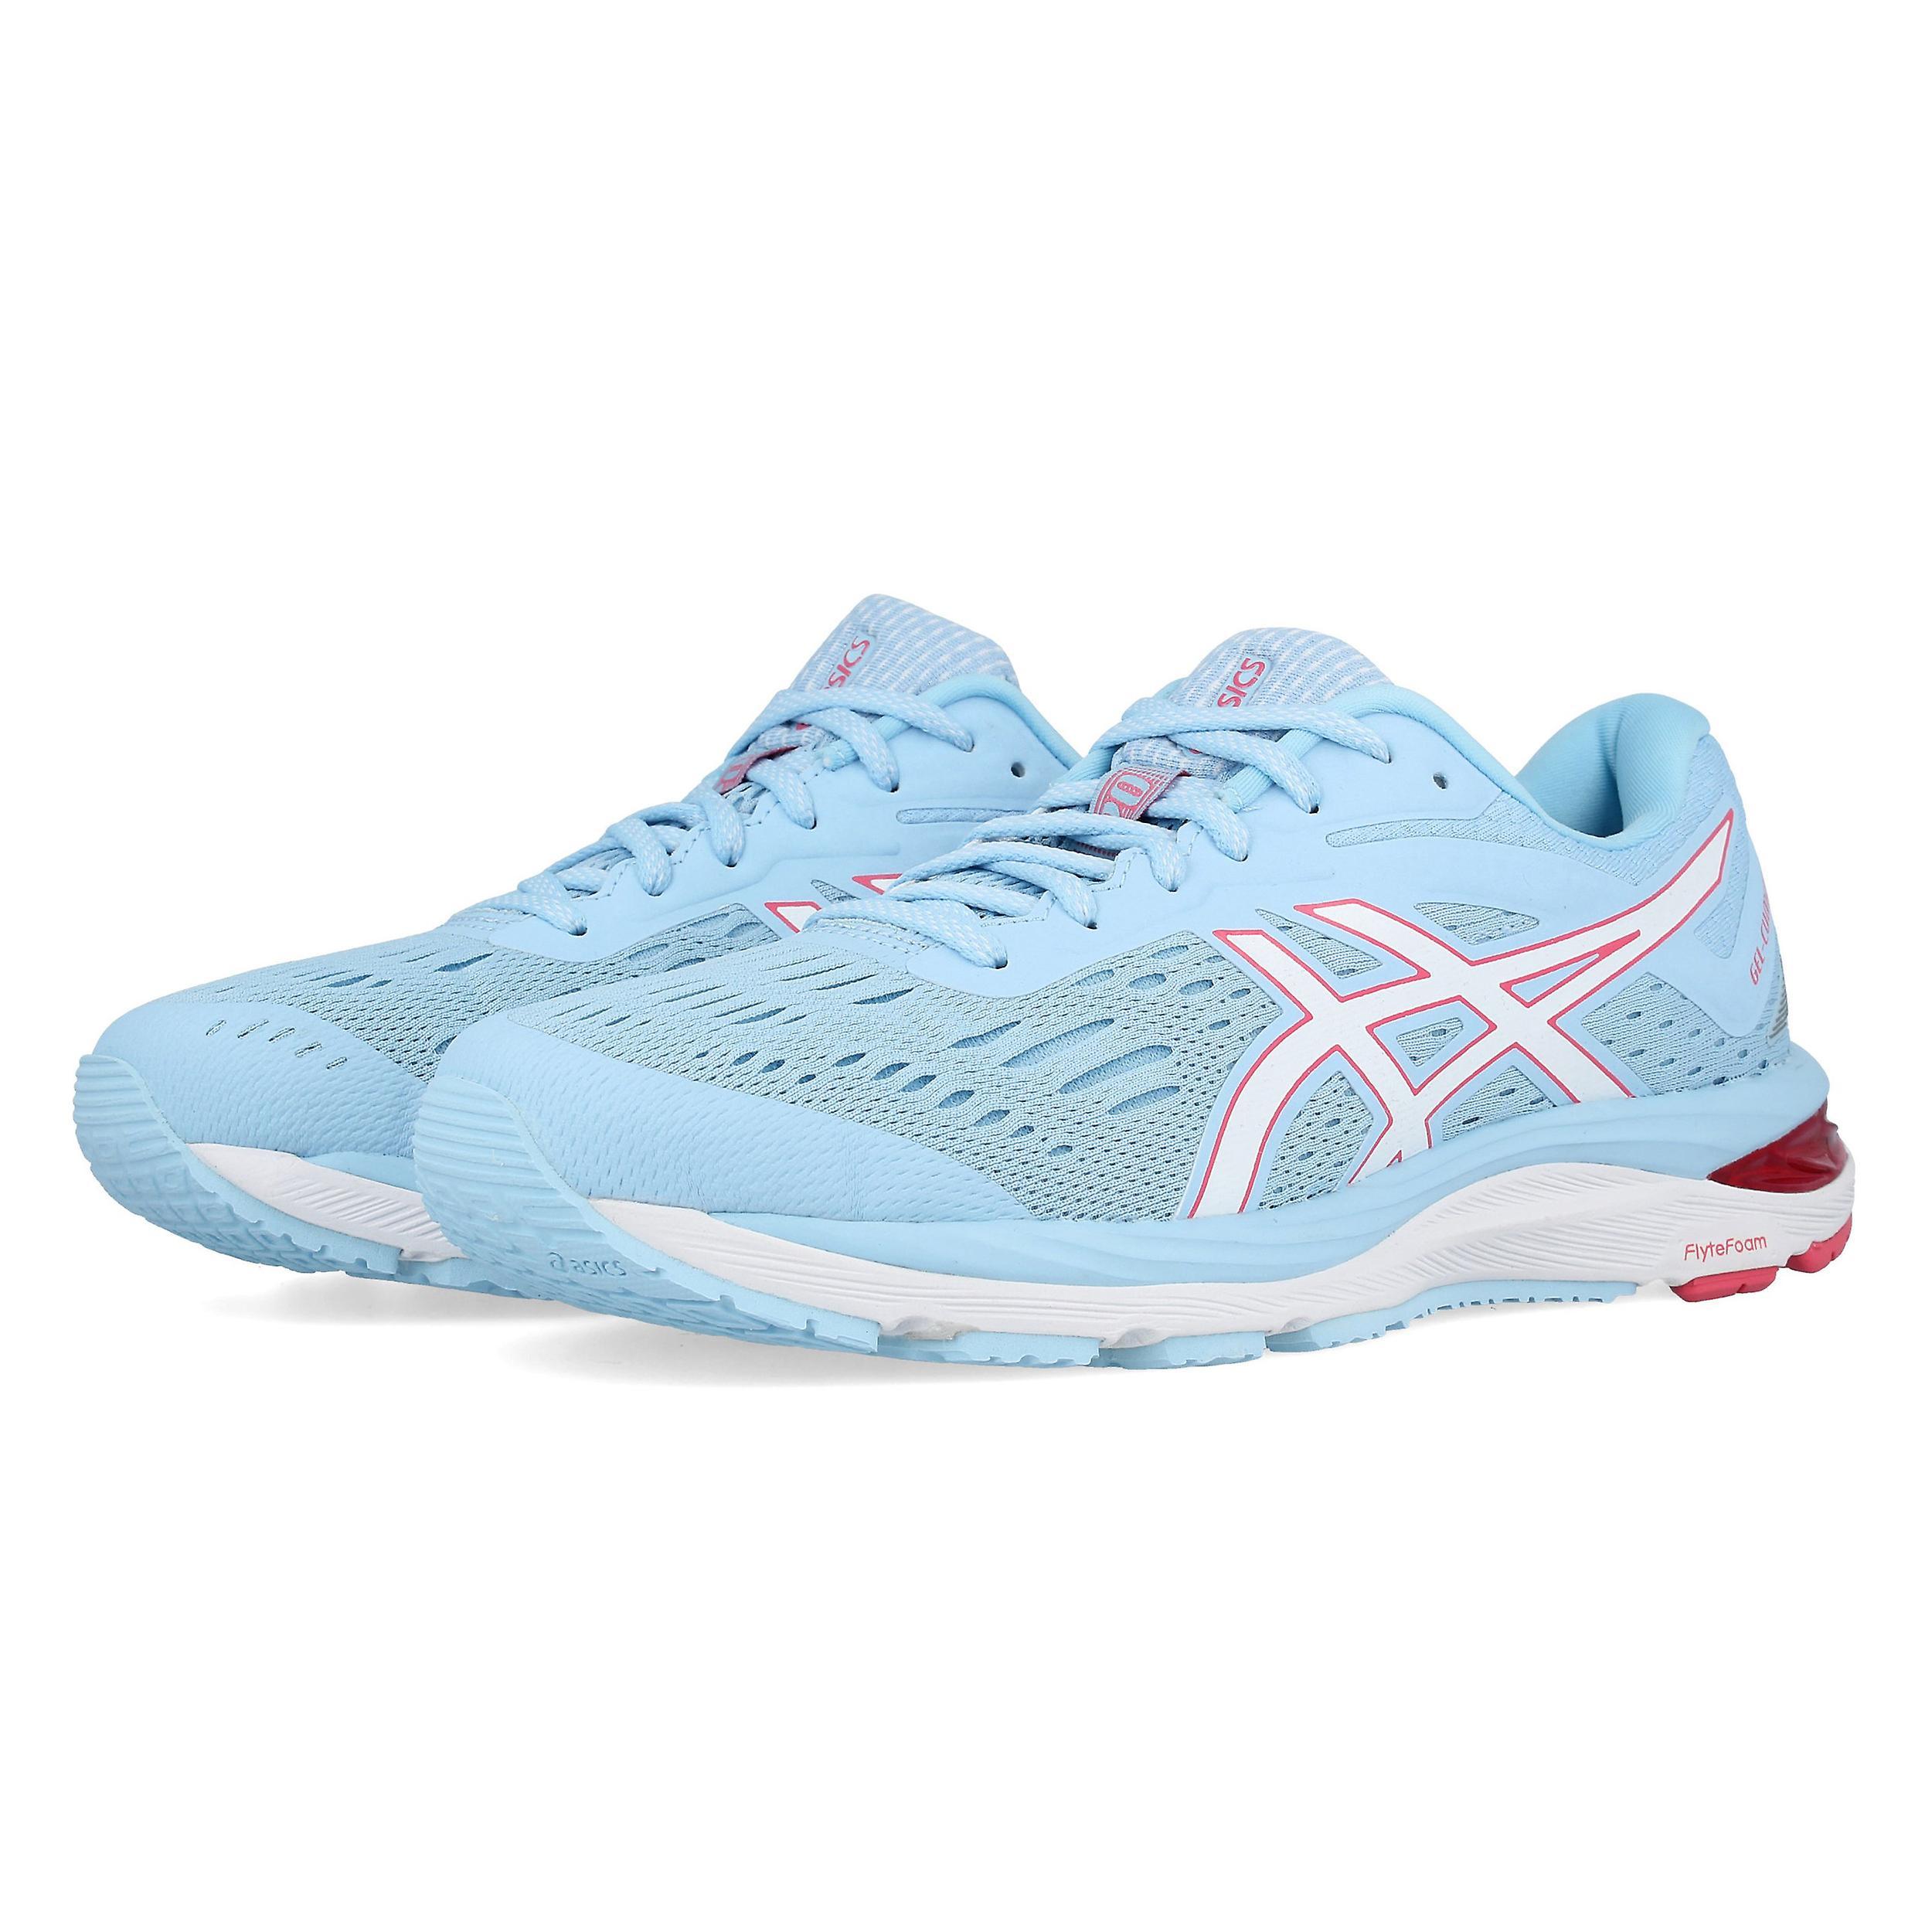 6af90f33079d ASICS Gel-Cumulus 20 Women's Running Shoes | Fruugo